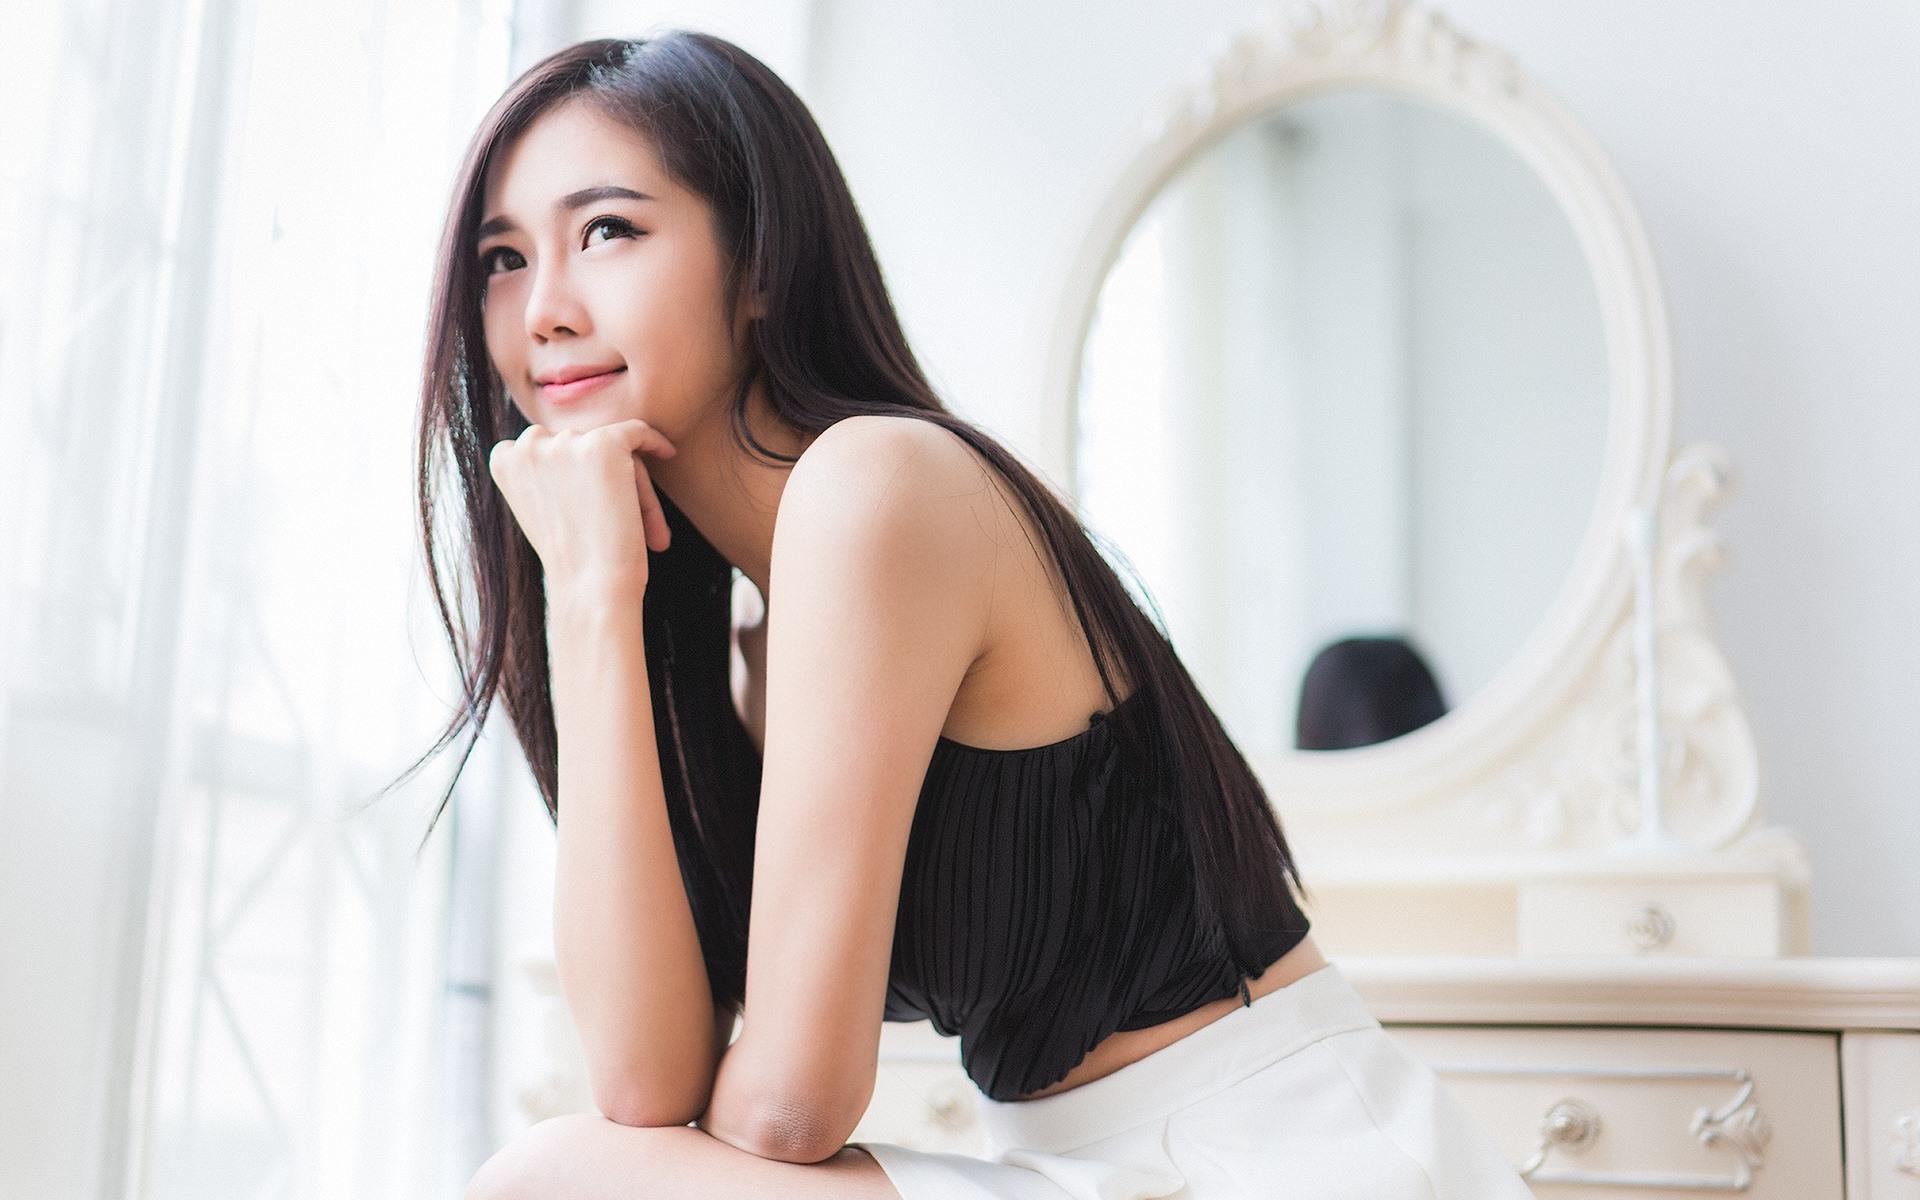 Asian model photo galleries, erotic e mail pen pal